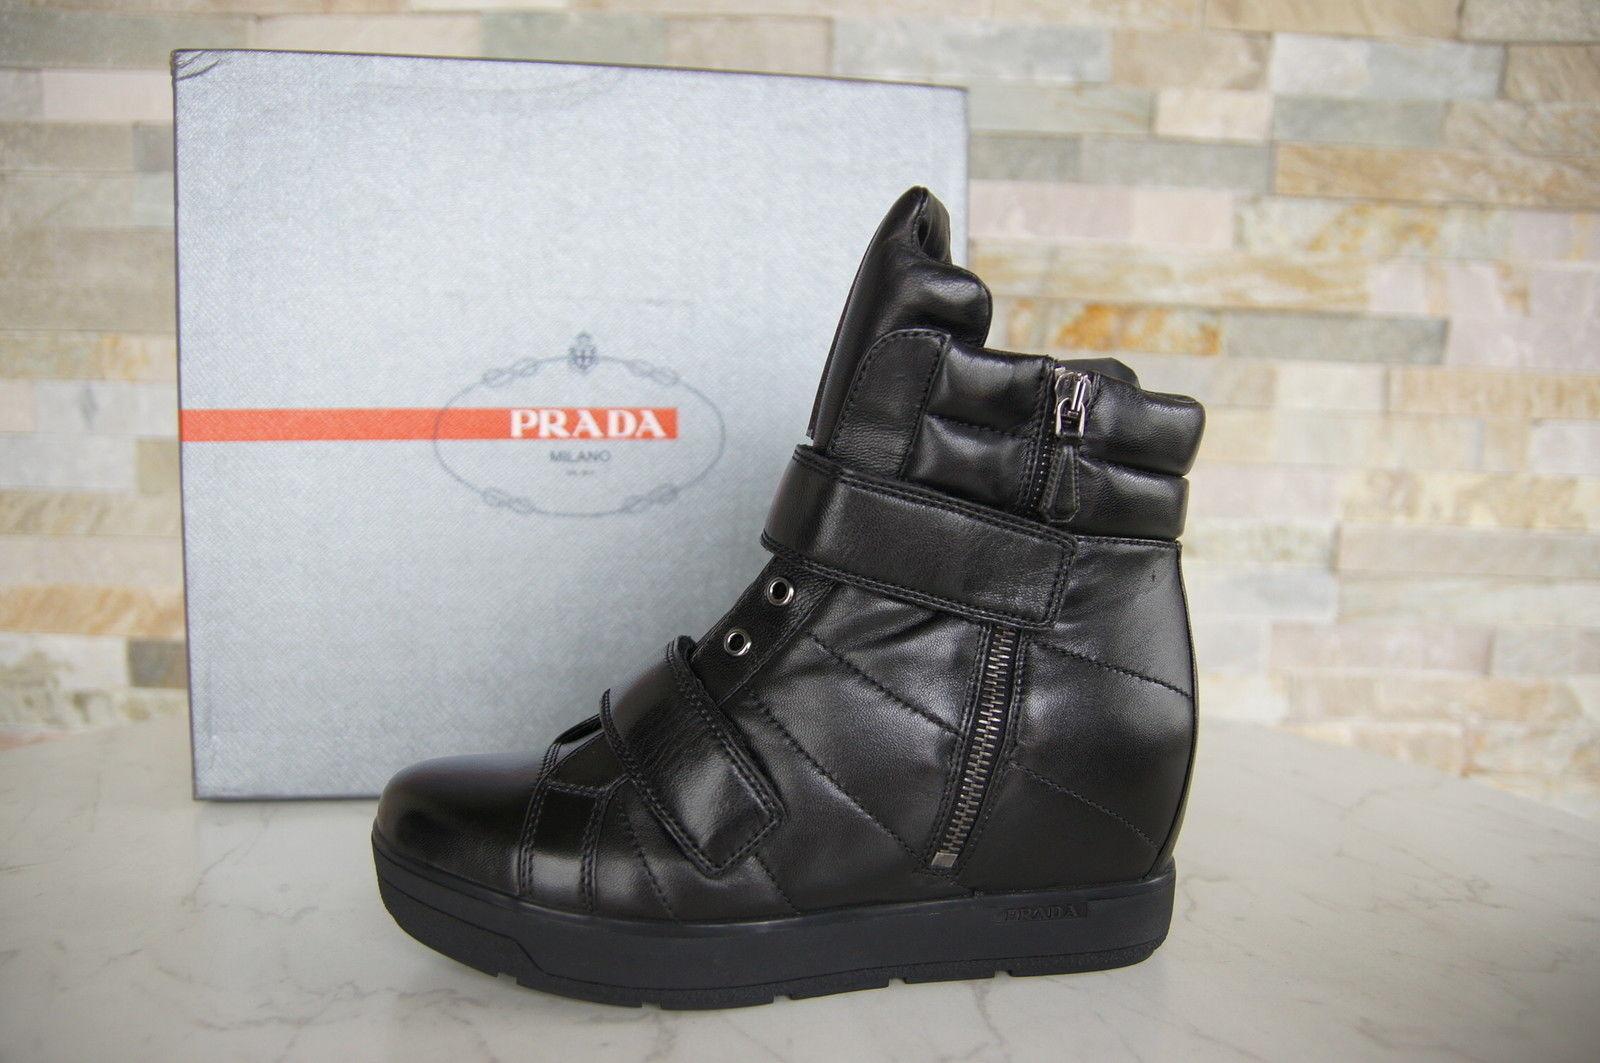 PRADA  schwarz 35,5 Stiefeletten Keil Booties Sneakers shoes Lamm schwarz  nero neu 8dd7ab